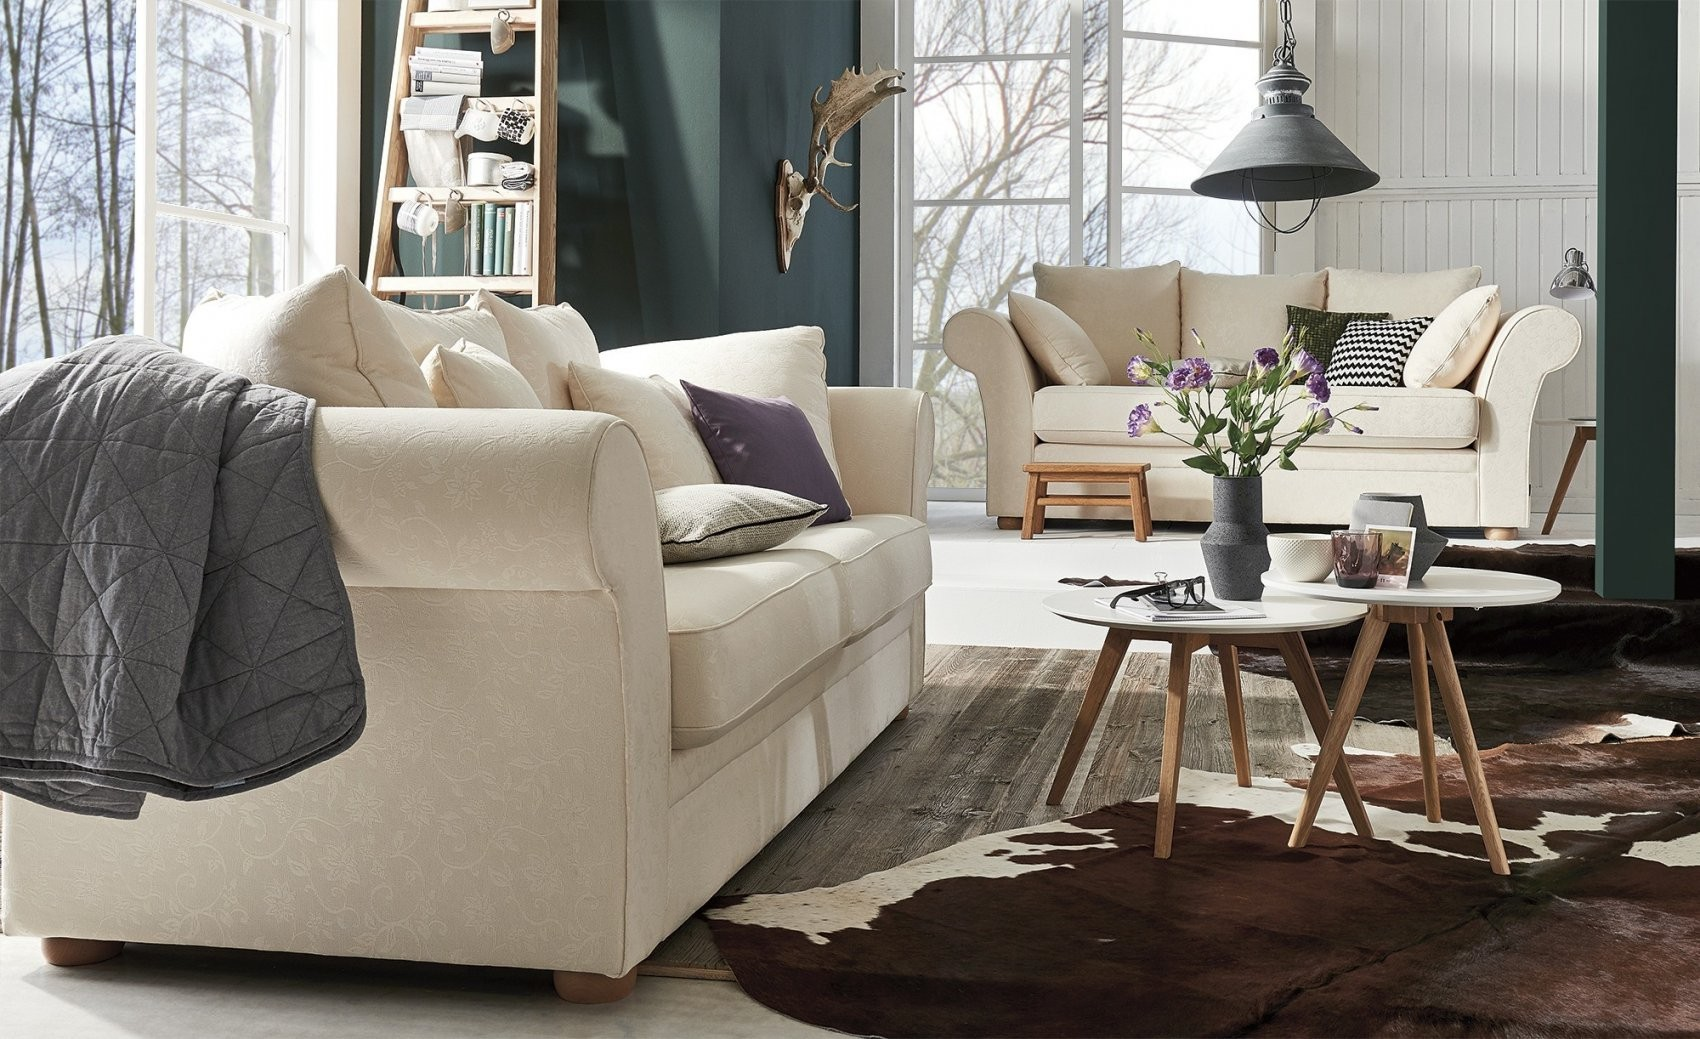 Sofa Ideen Faszinierend Sofa Landhausstil Liebreizend Sofa von Sofa Landhausstil Holz Bild